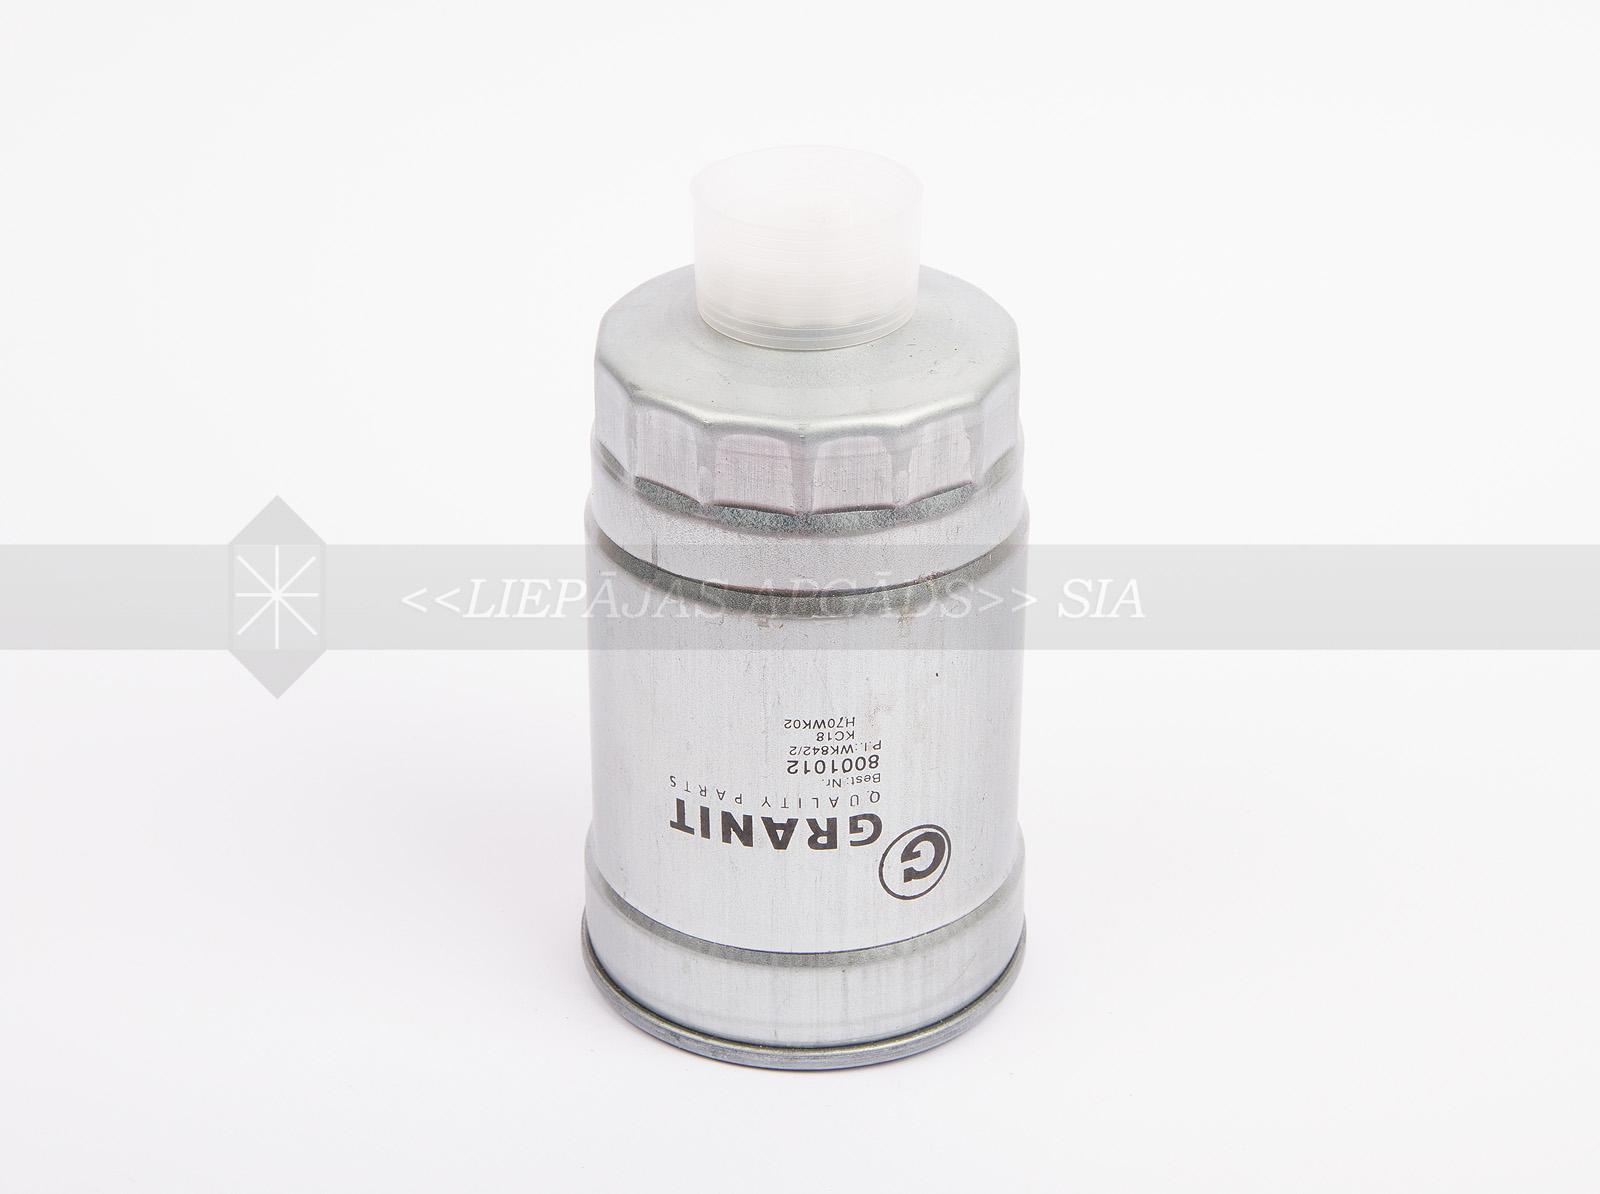 DEGVIELAS FILTRS GRANIT (WK842/2, P550248, FF5135)